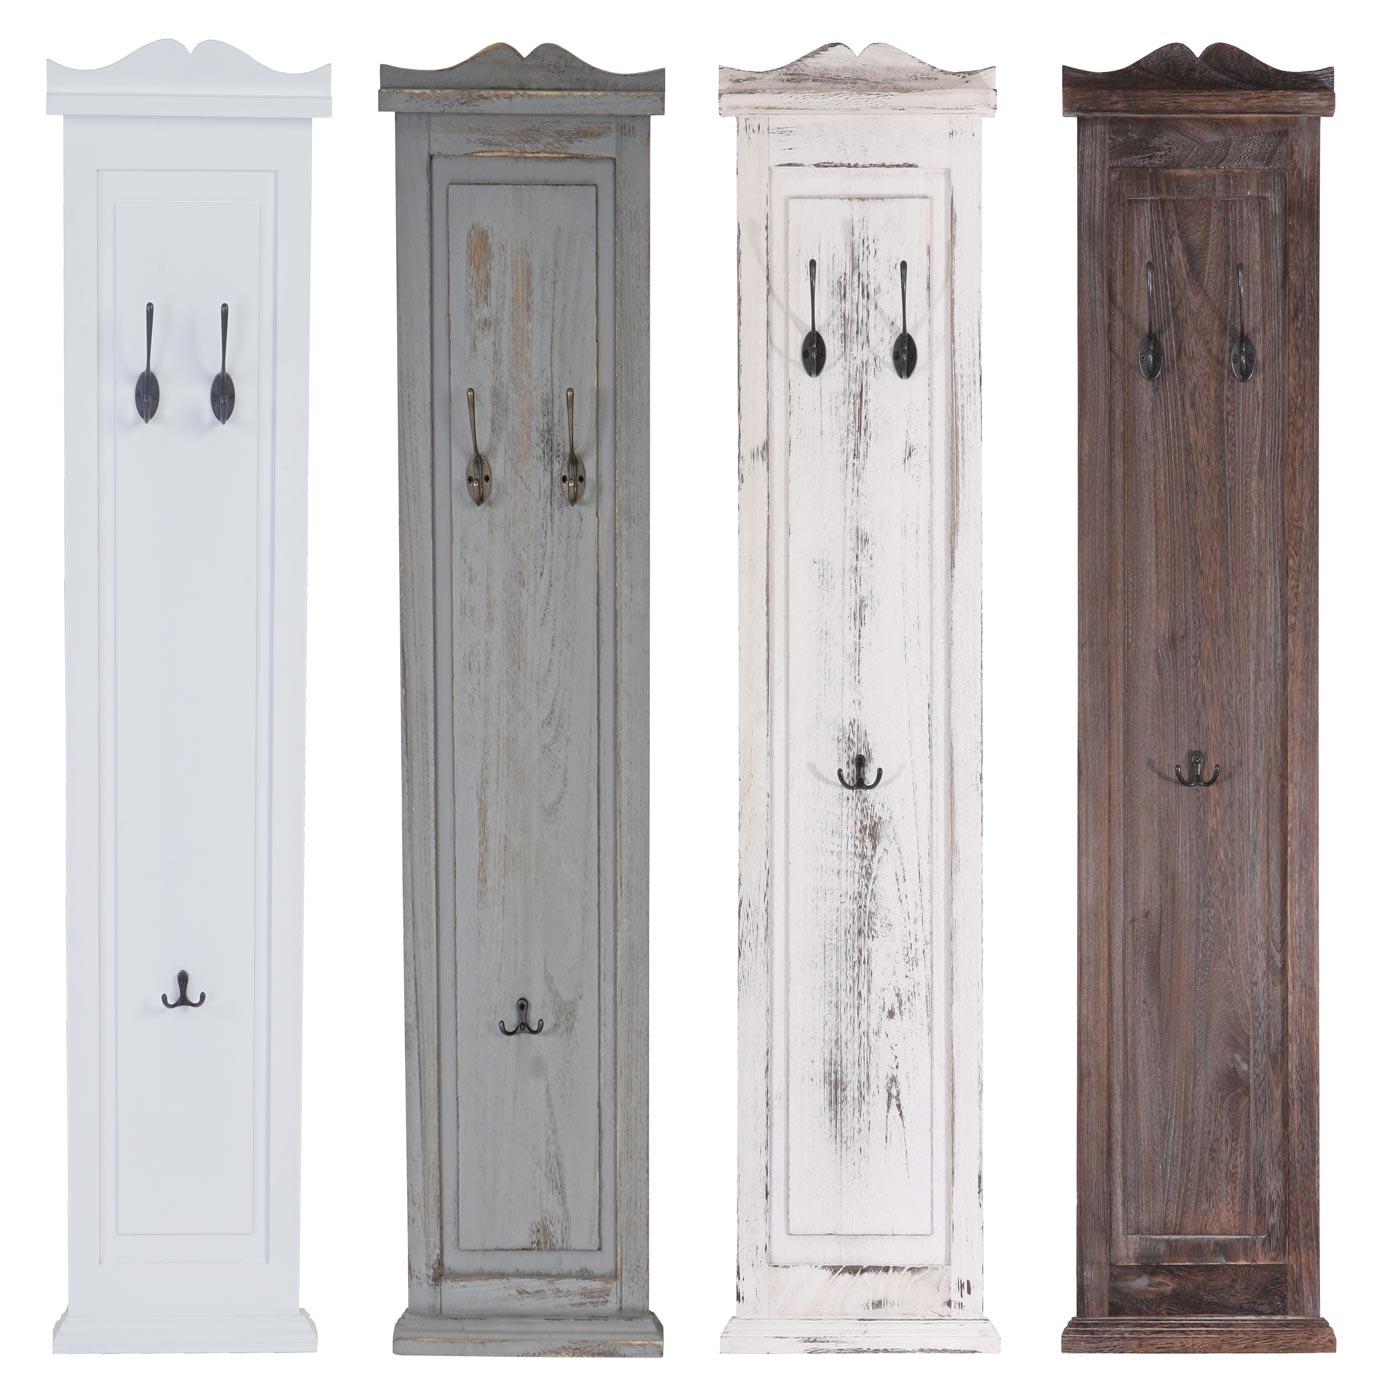 2x garderobe wandgarderobe garderobenpaneel wandhaken. Black Bedroom Furniture Sets. Home Design Ideas